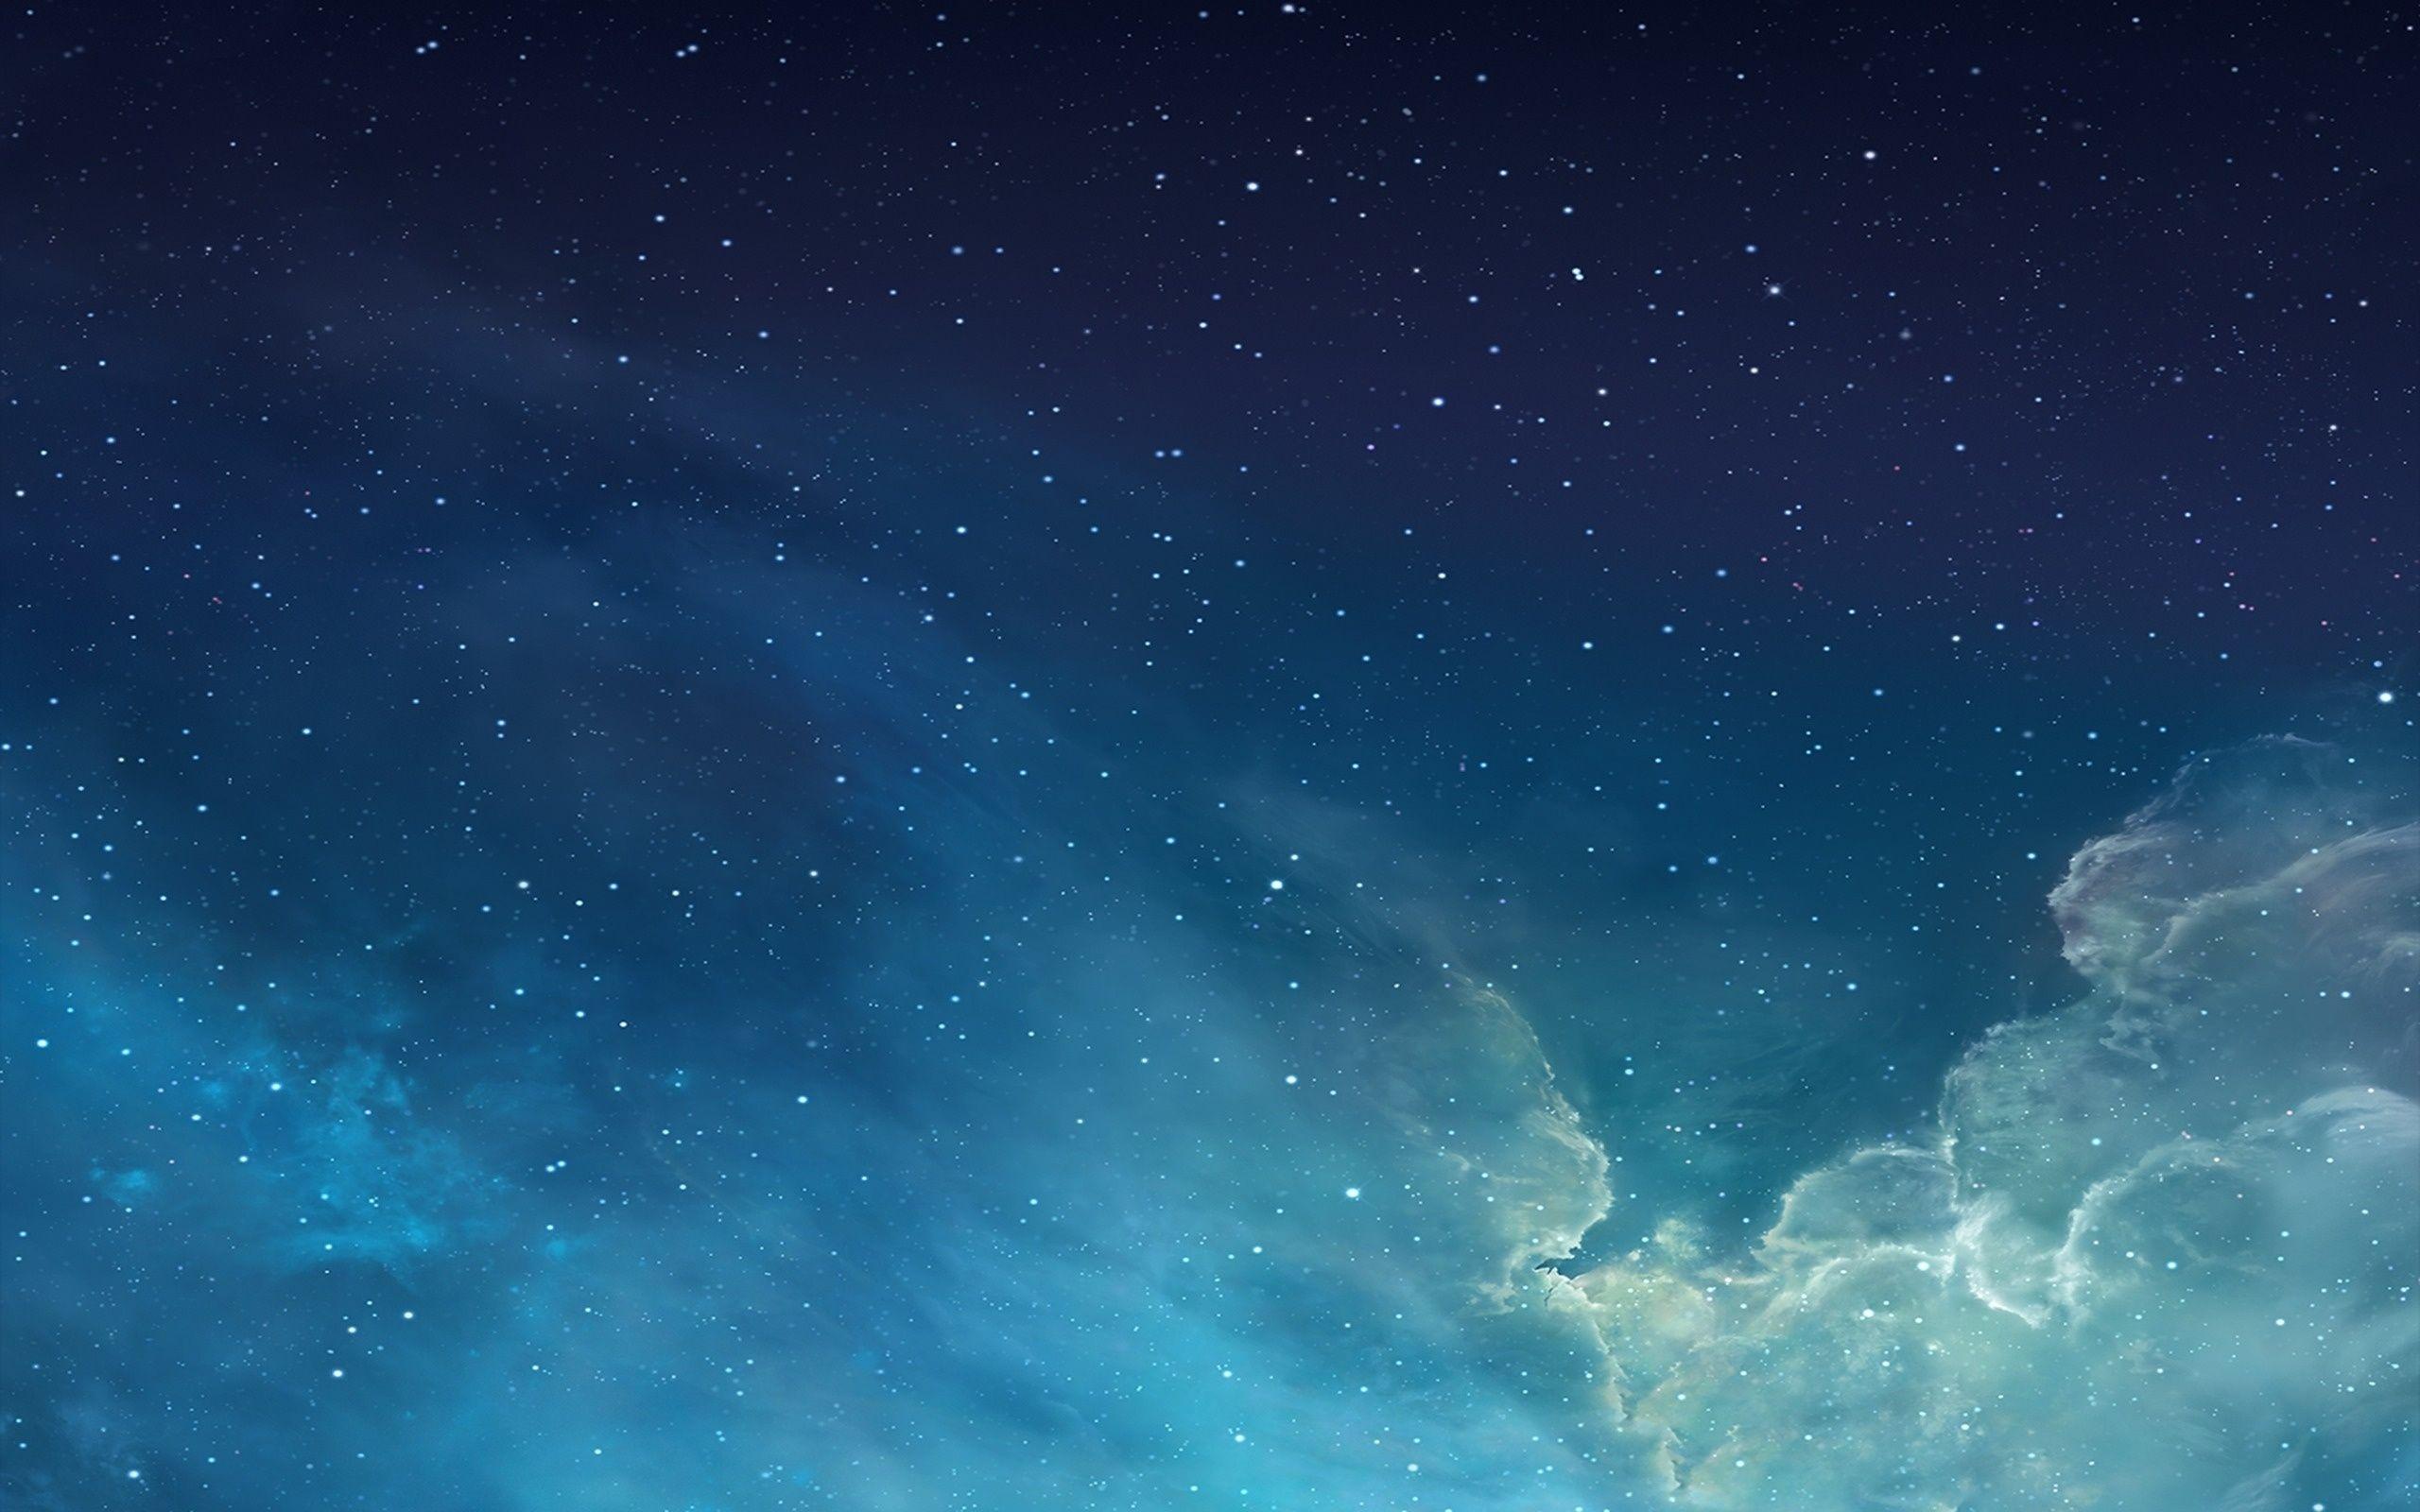 10 Latest Light Blue Space Background Full Hd 1920 1080 For Pc Background Hd Wallpaper Desktop Galaxy Wallpaper Blue Sky Wallpaper